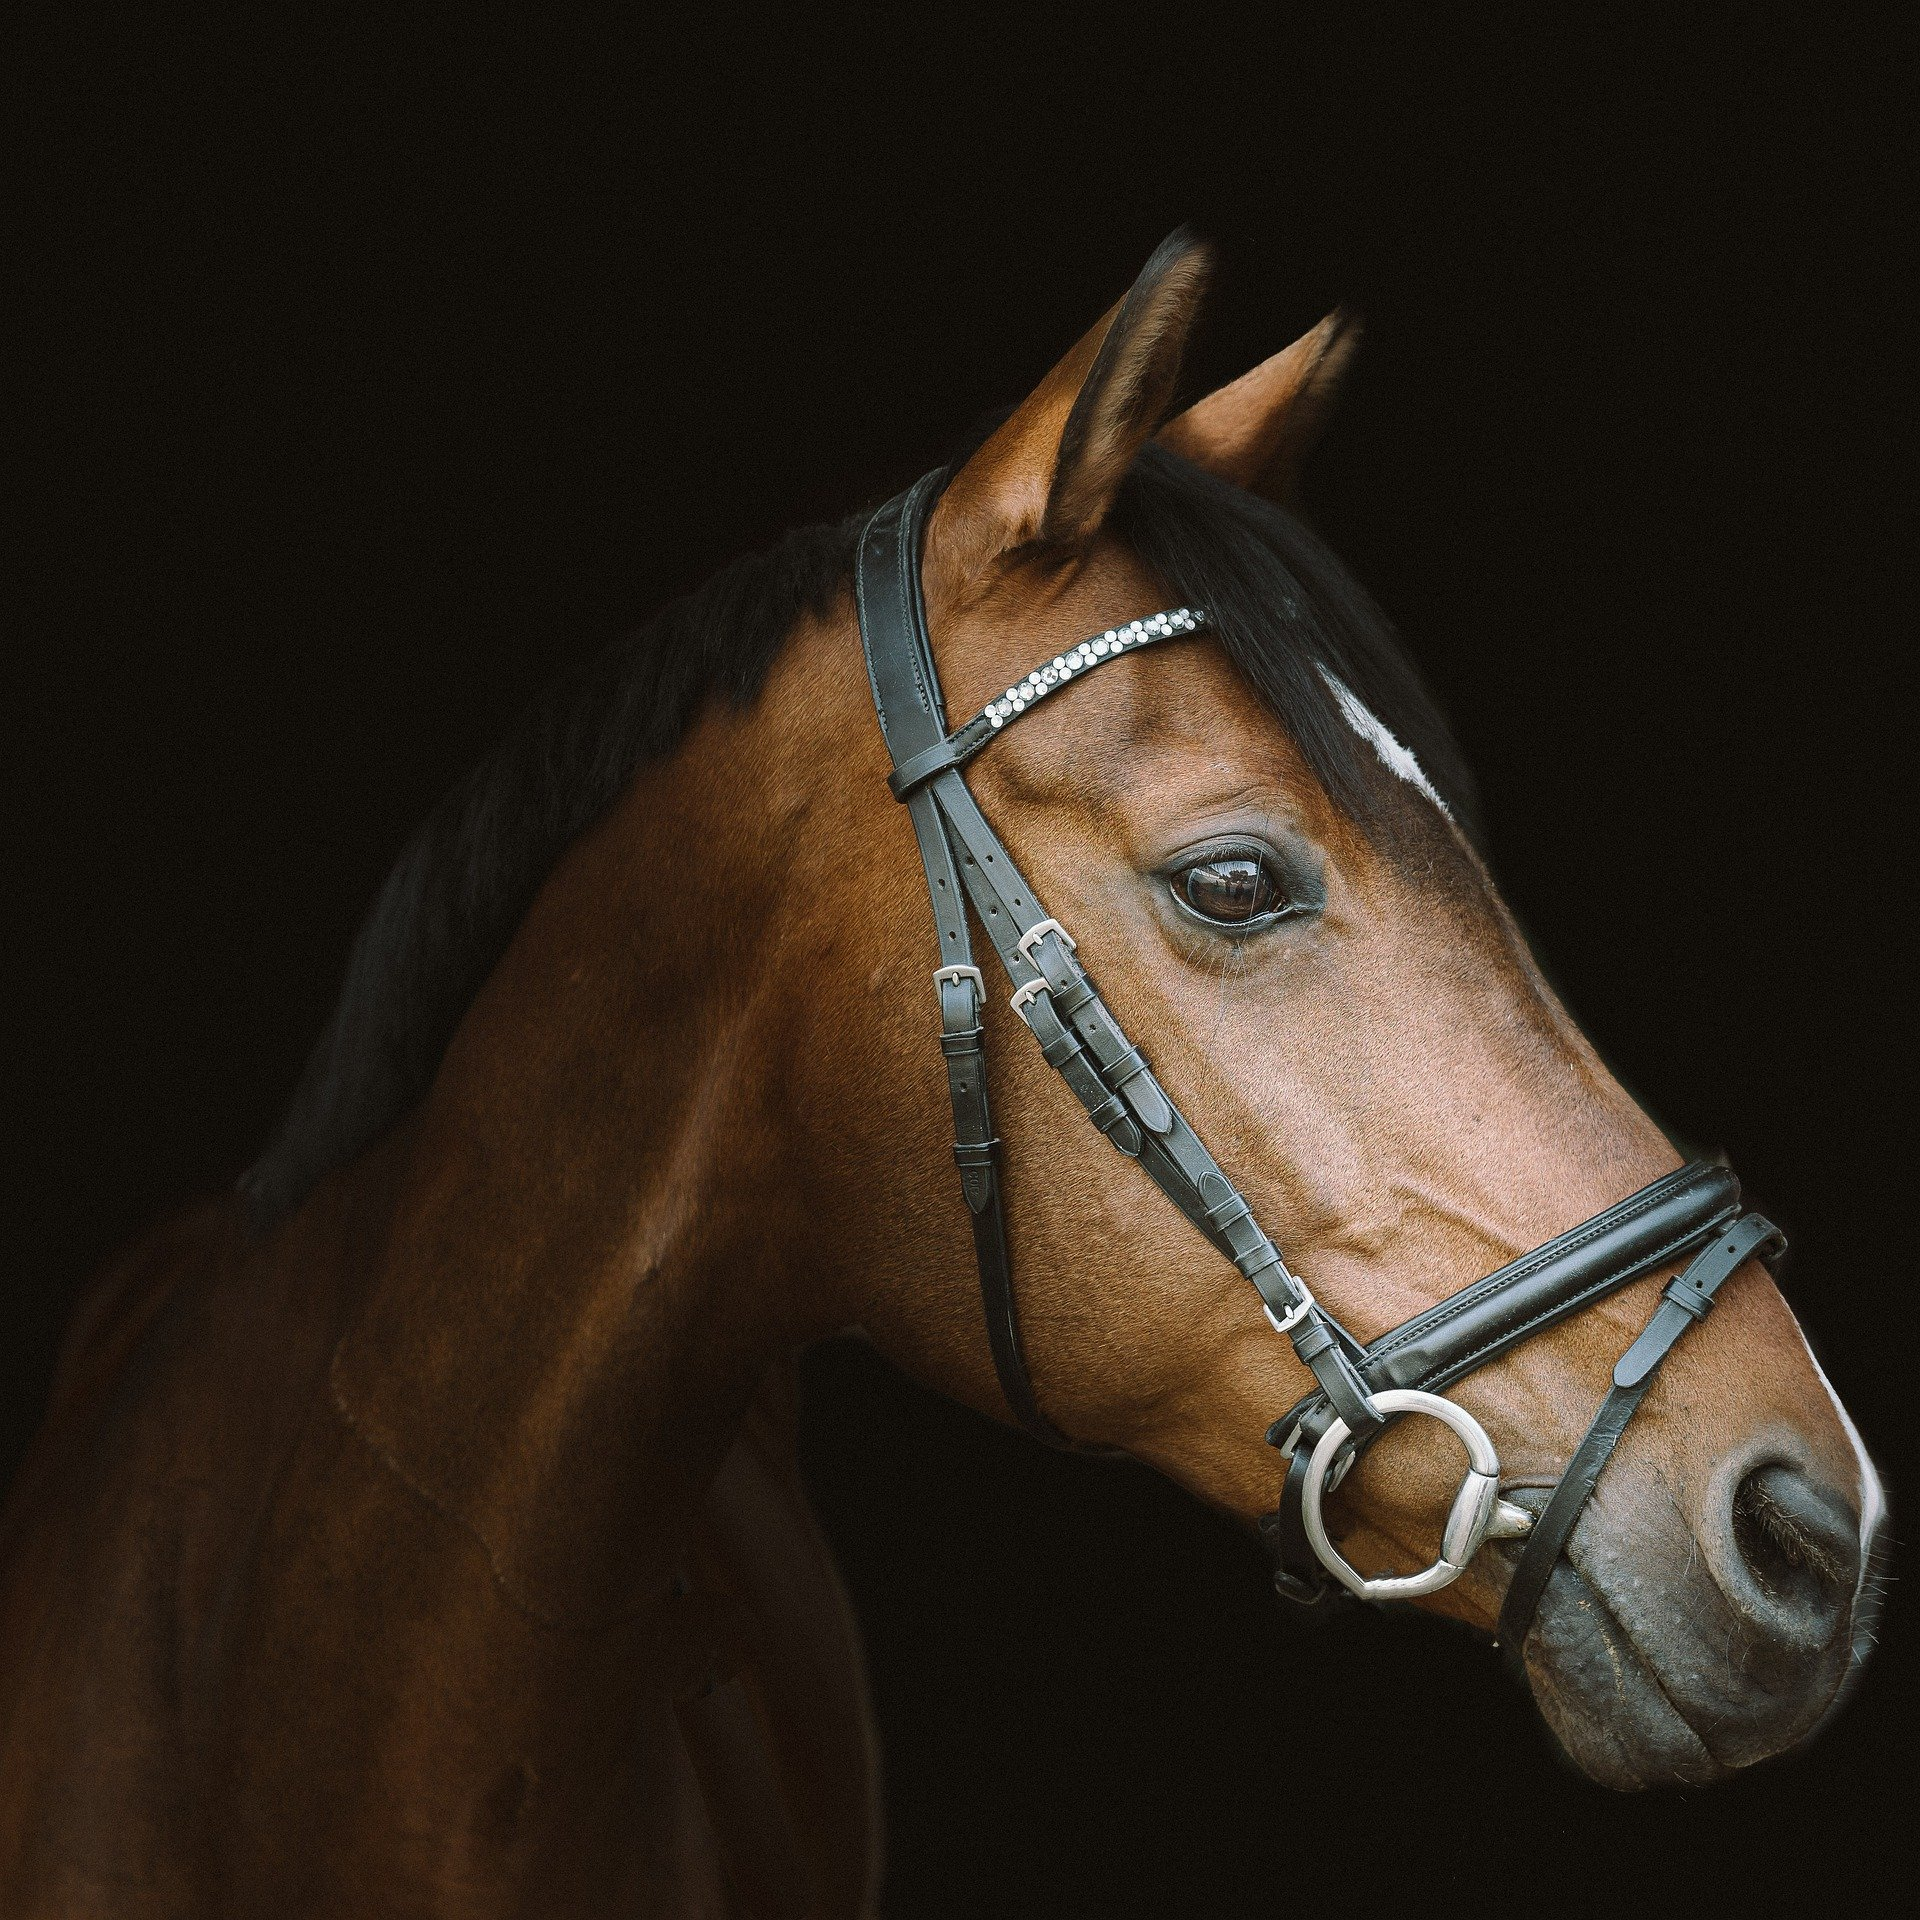 horse-4330166_1920